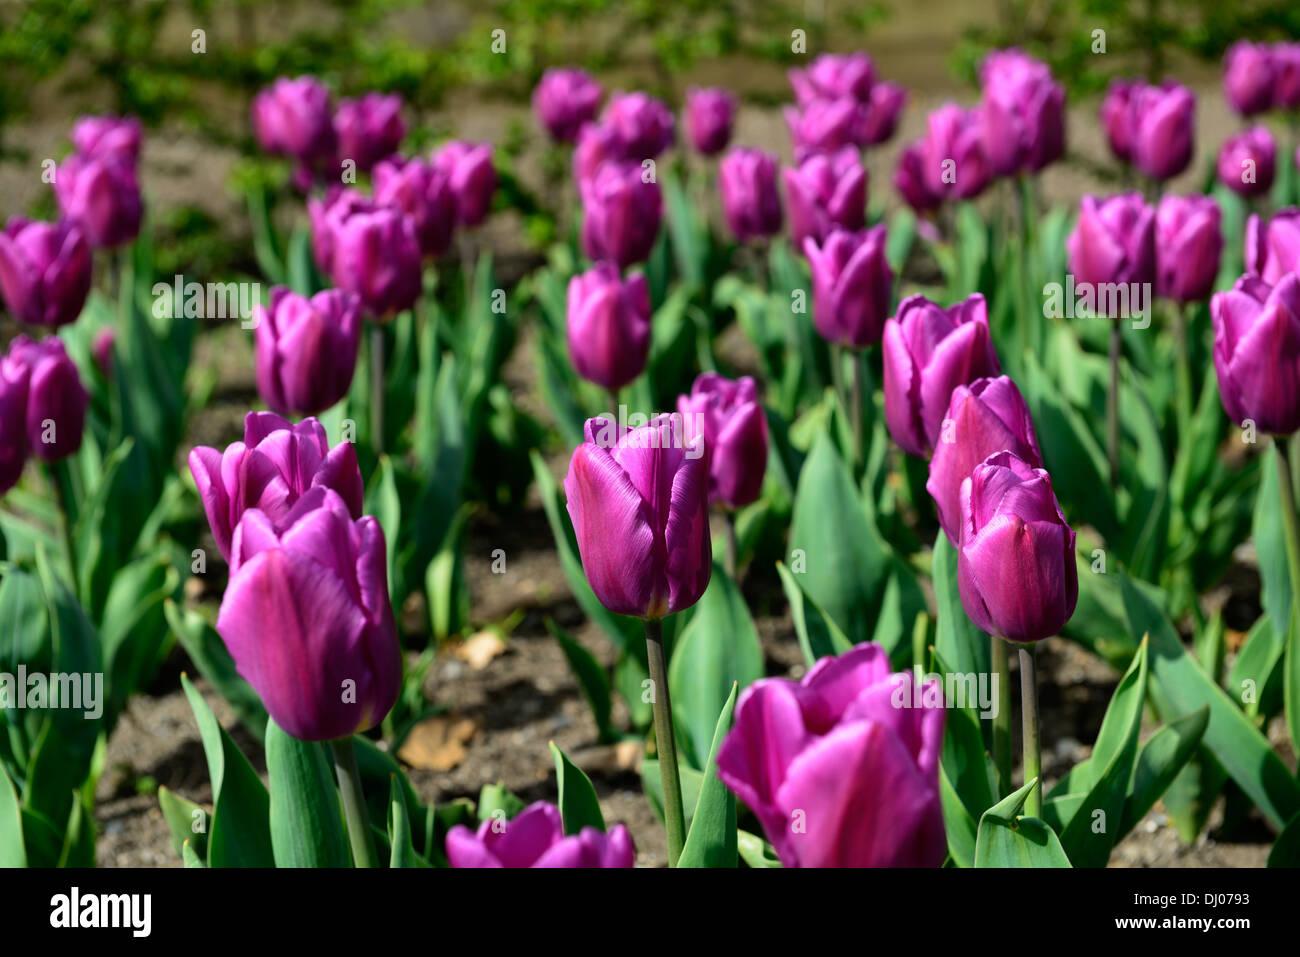 Tulipa negrita stock photos tulipa negrita stock images alamy tulipa negrita purple pink flowers flowering blooms spring early summer may tulips tulip stock image mightylinksfo